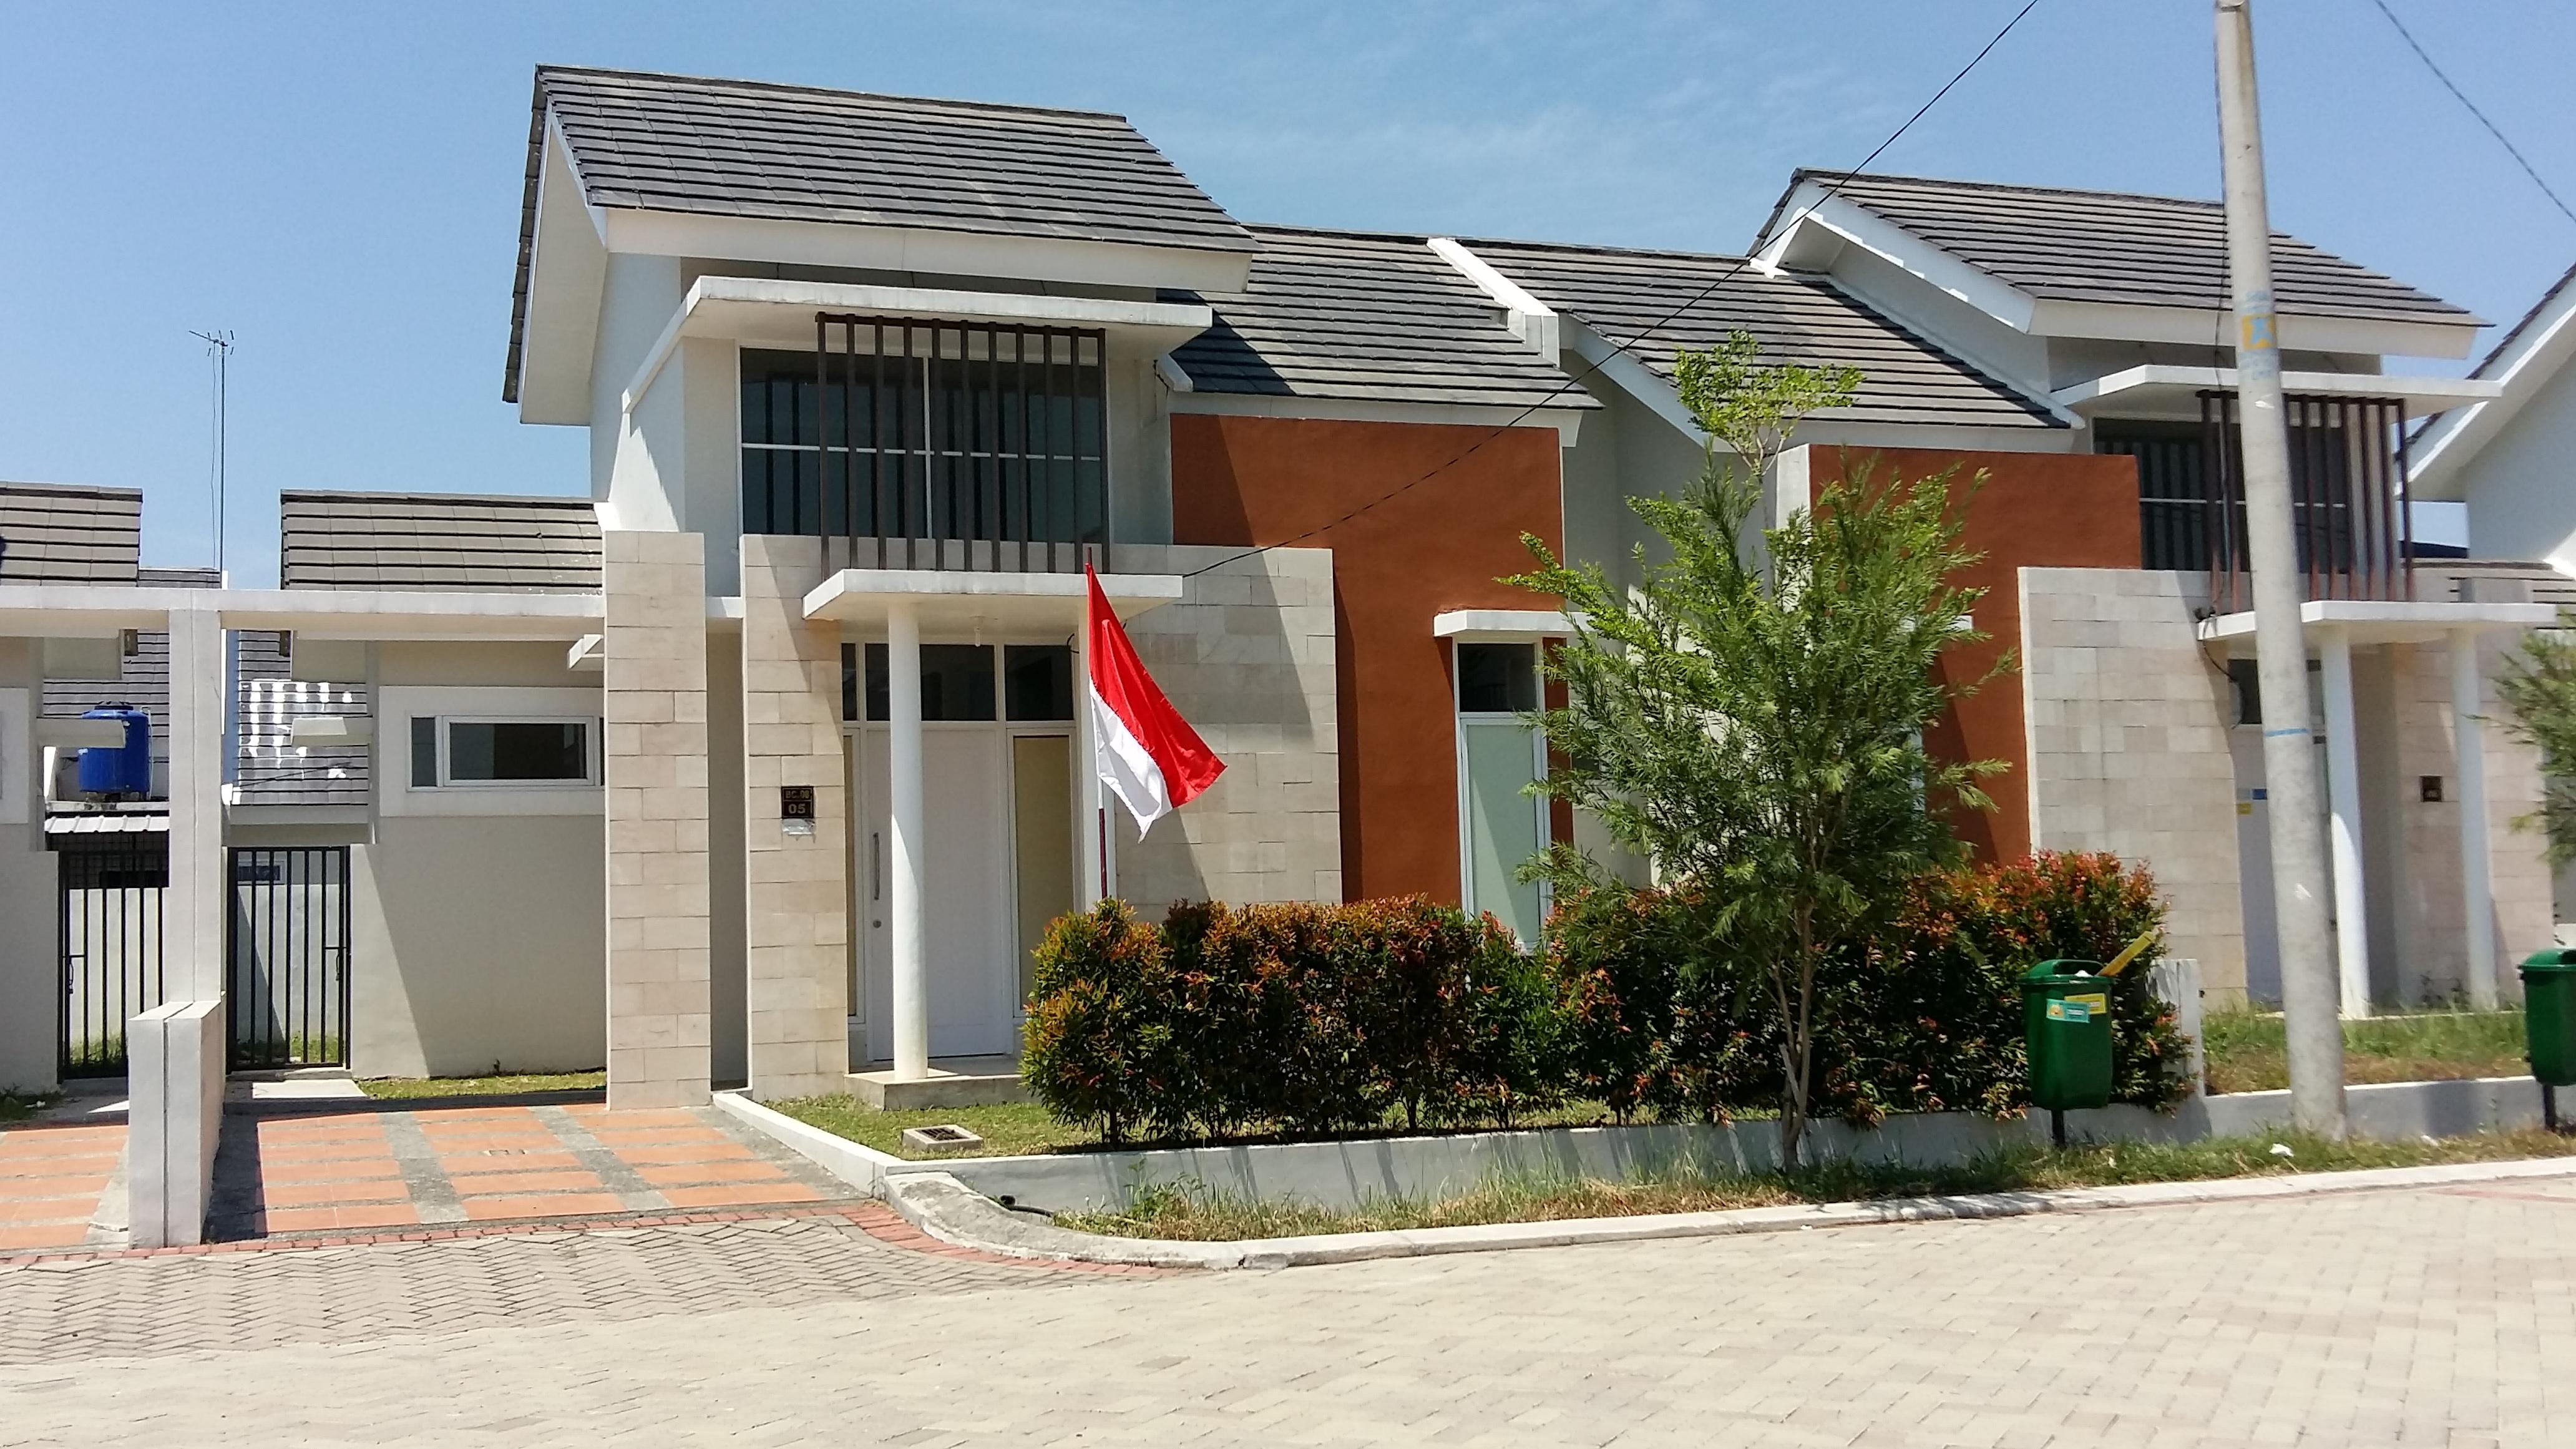 Sewa 2 Bedroom Clean Comfortable Villa Jonggol Traveliocom